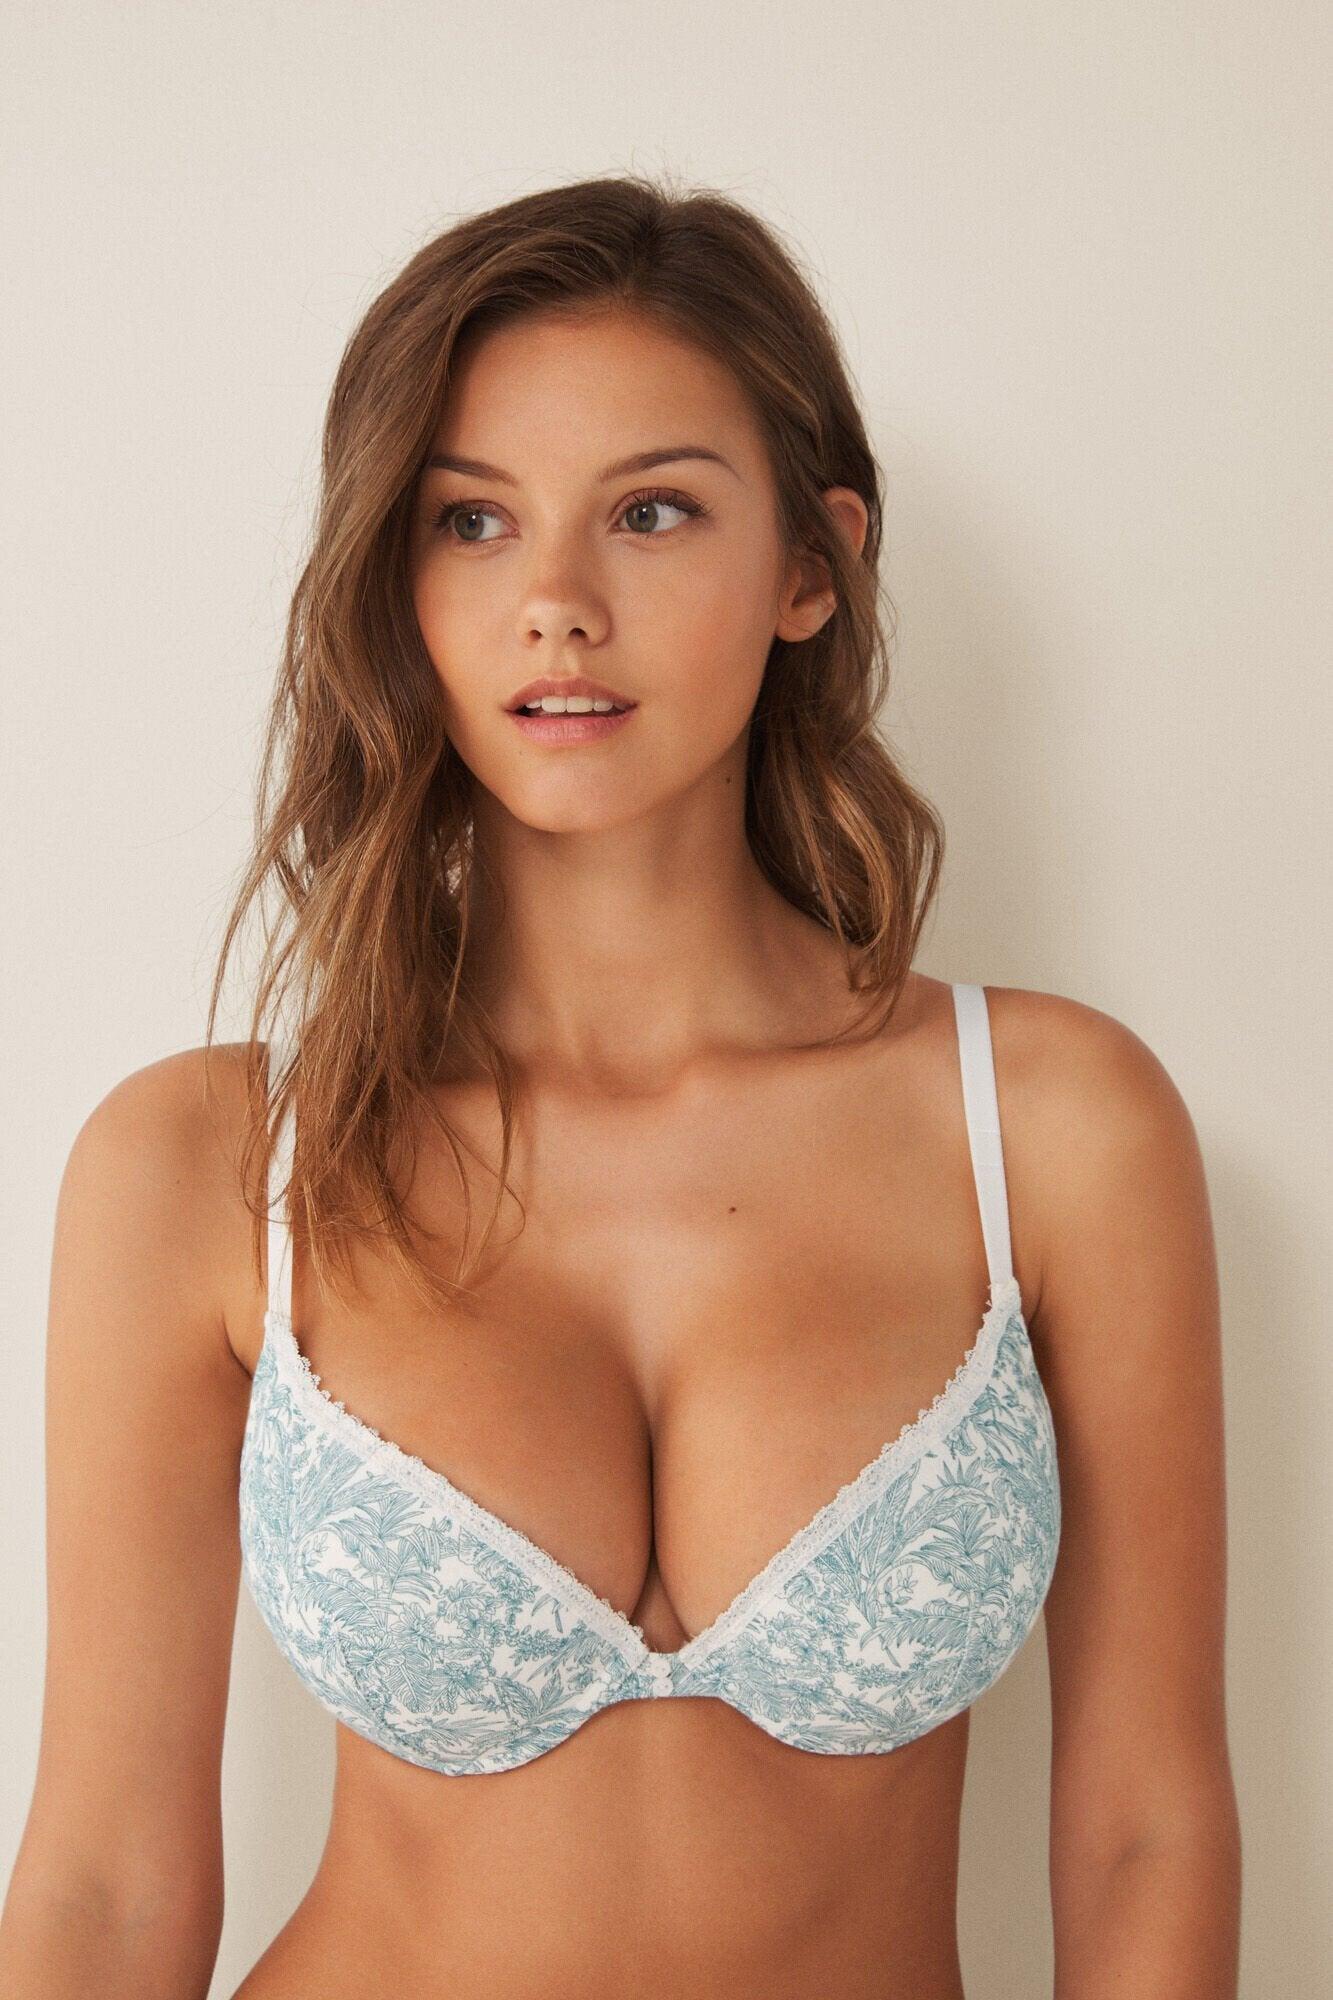 boobs shower porn at big nice tits